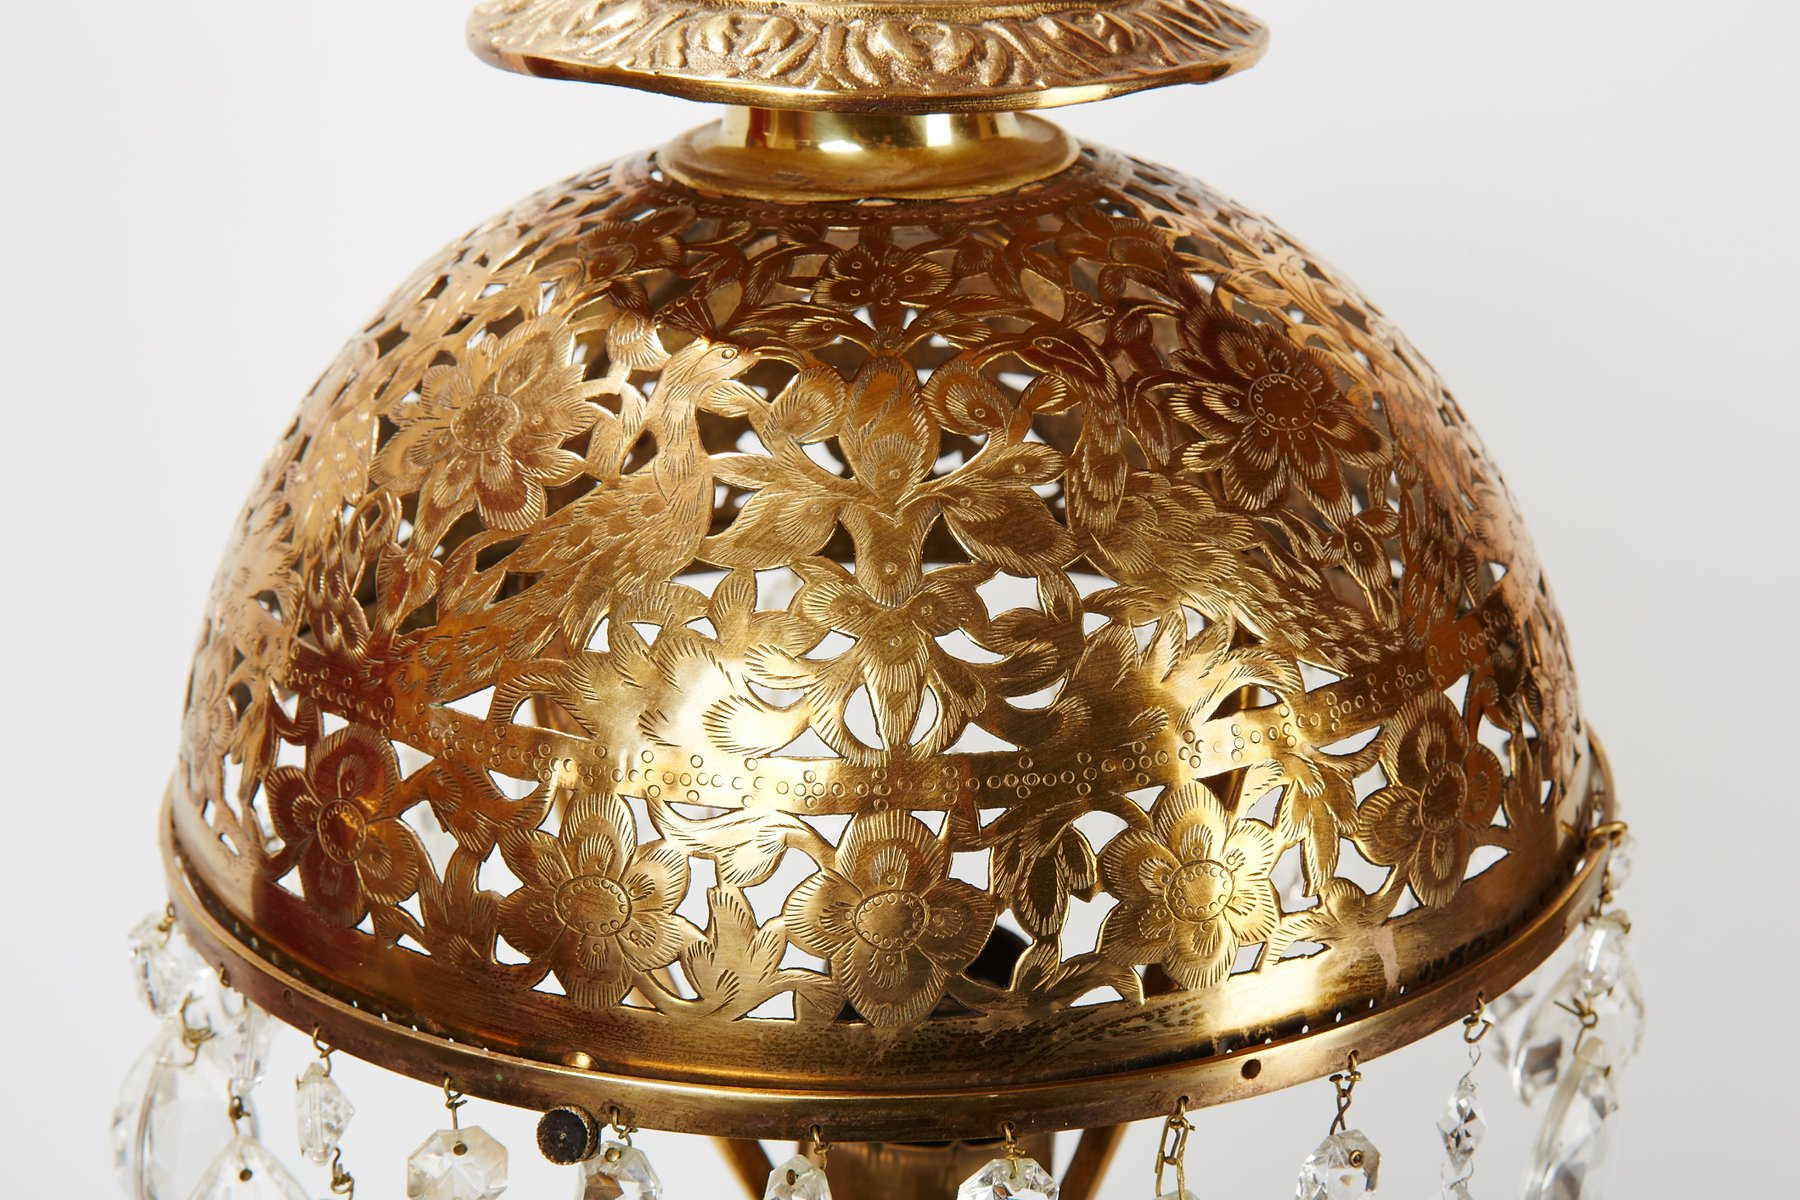 Vintage Crystal U0026 Brass Table Lamp 7. $2,398.00. Price Per Piece